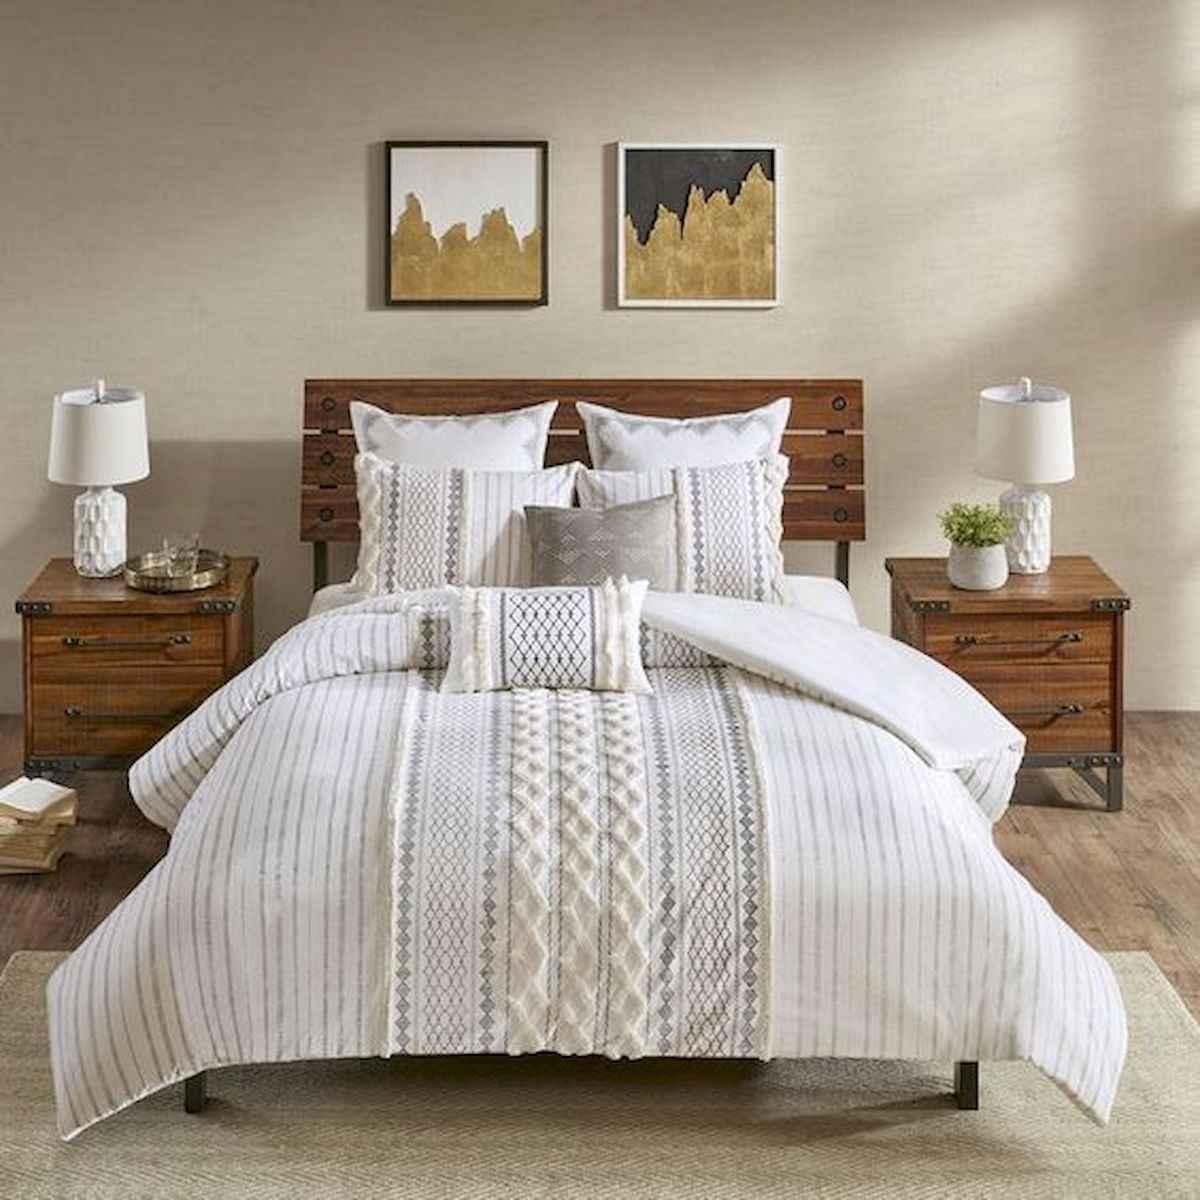 50 Favorite Bedding for Farmhouse Bedroom Design Ideas and Decor (29)